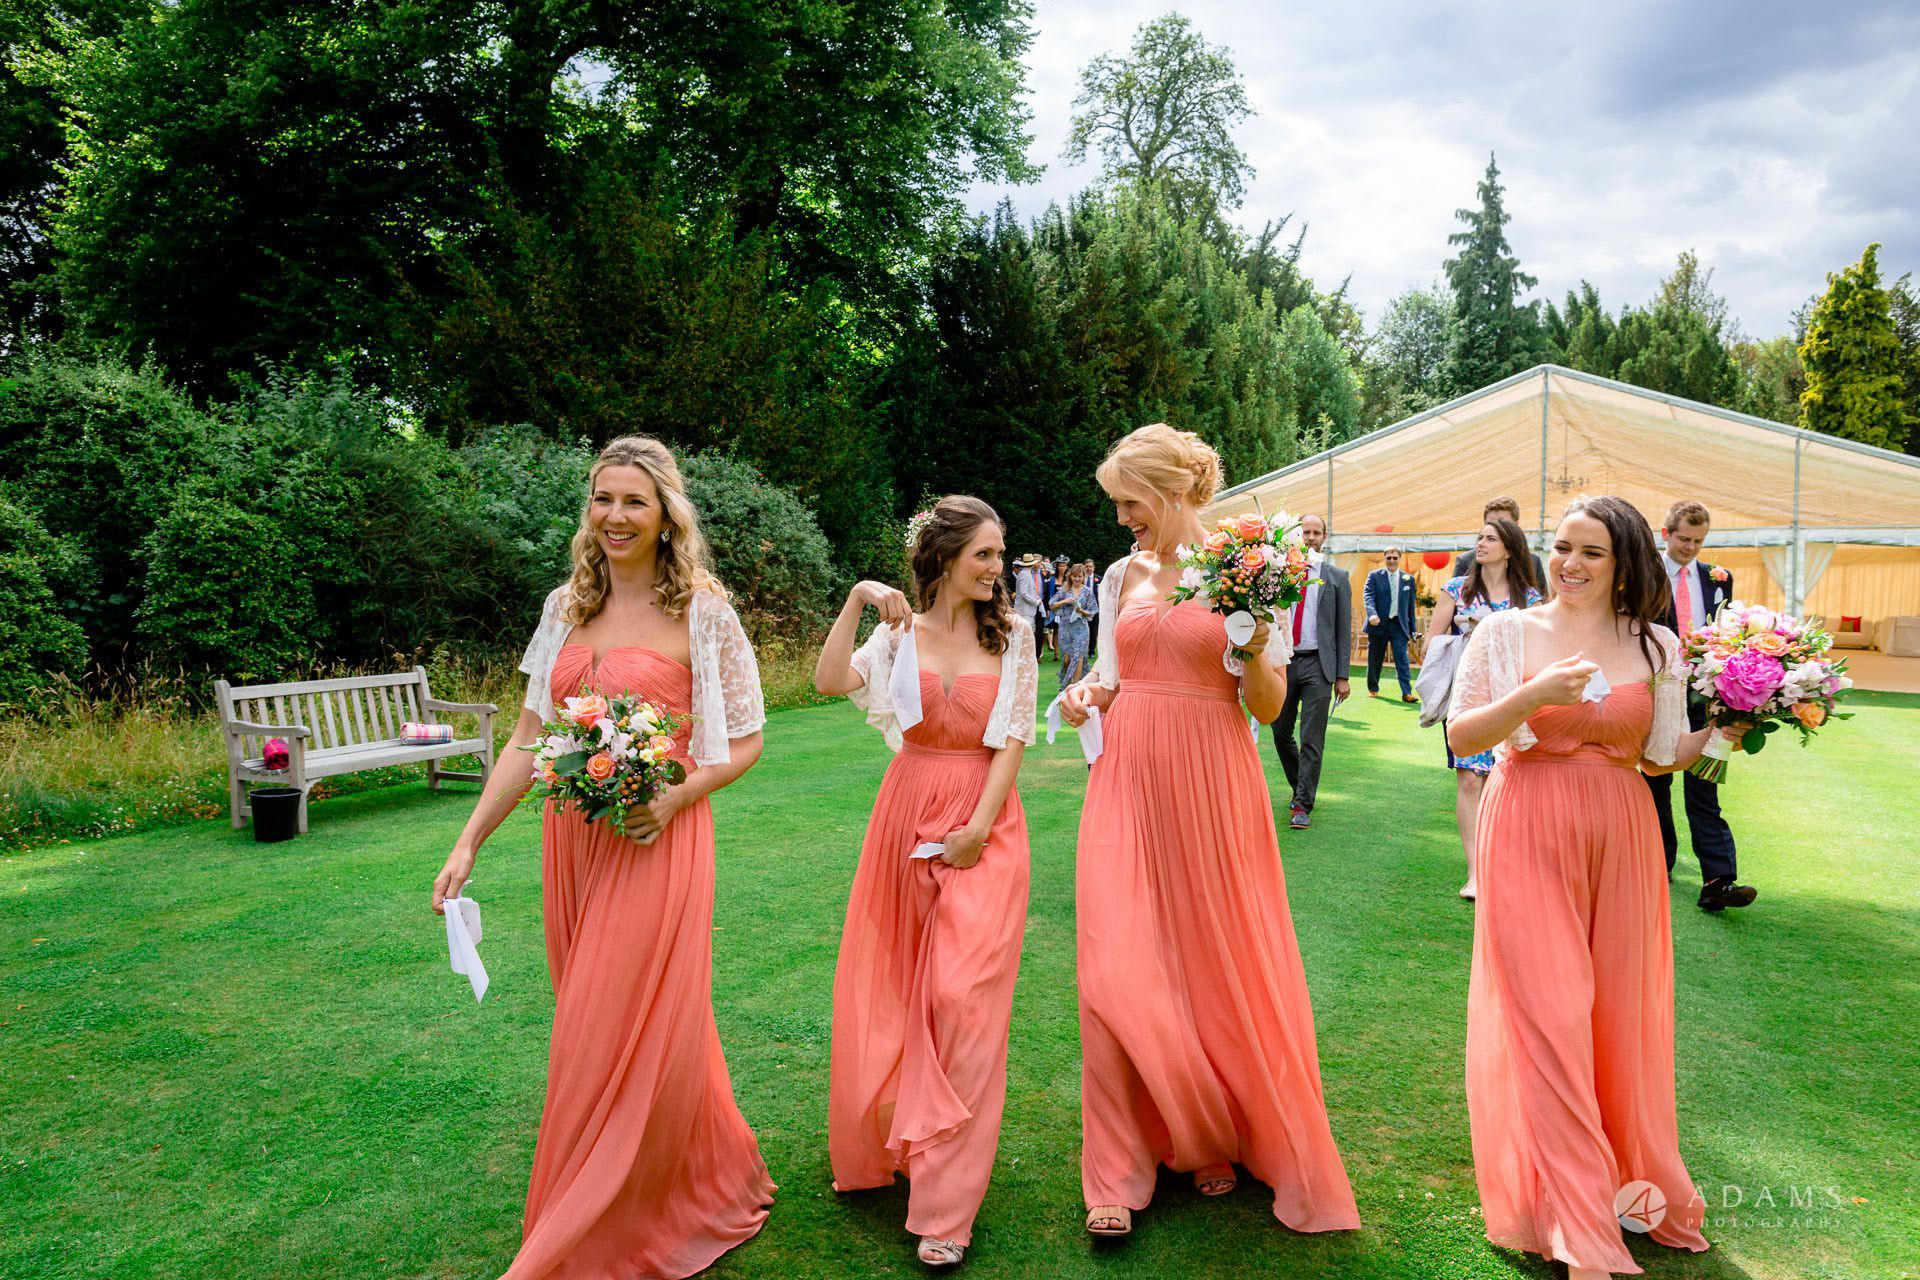 Clare College wedding photographer bridesmaids walk together